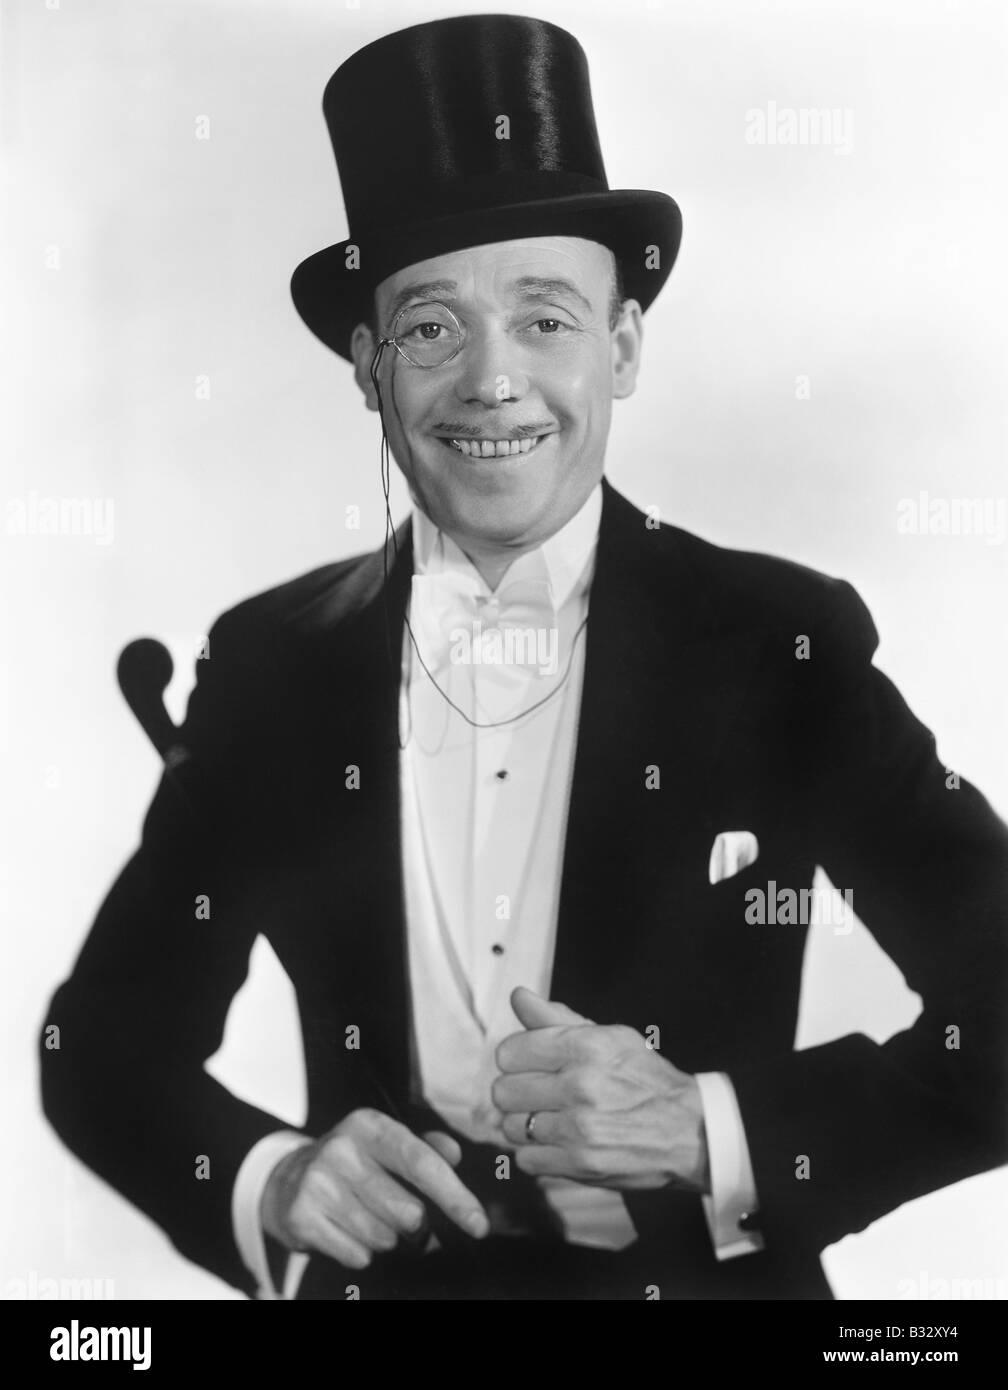 Portrait of a man in formal attire - Stock Image